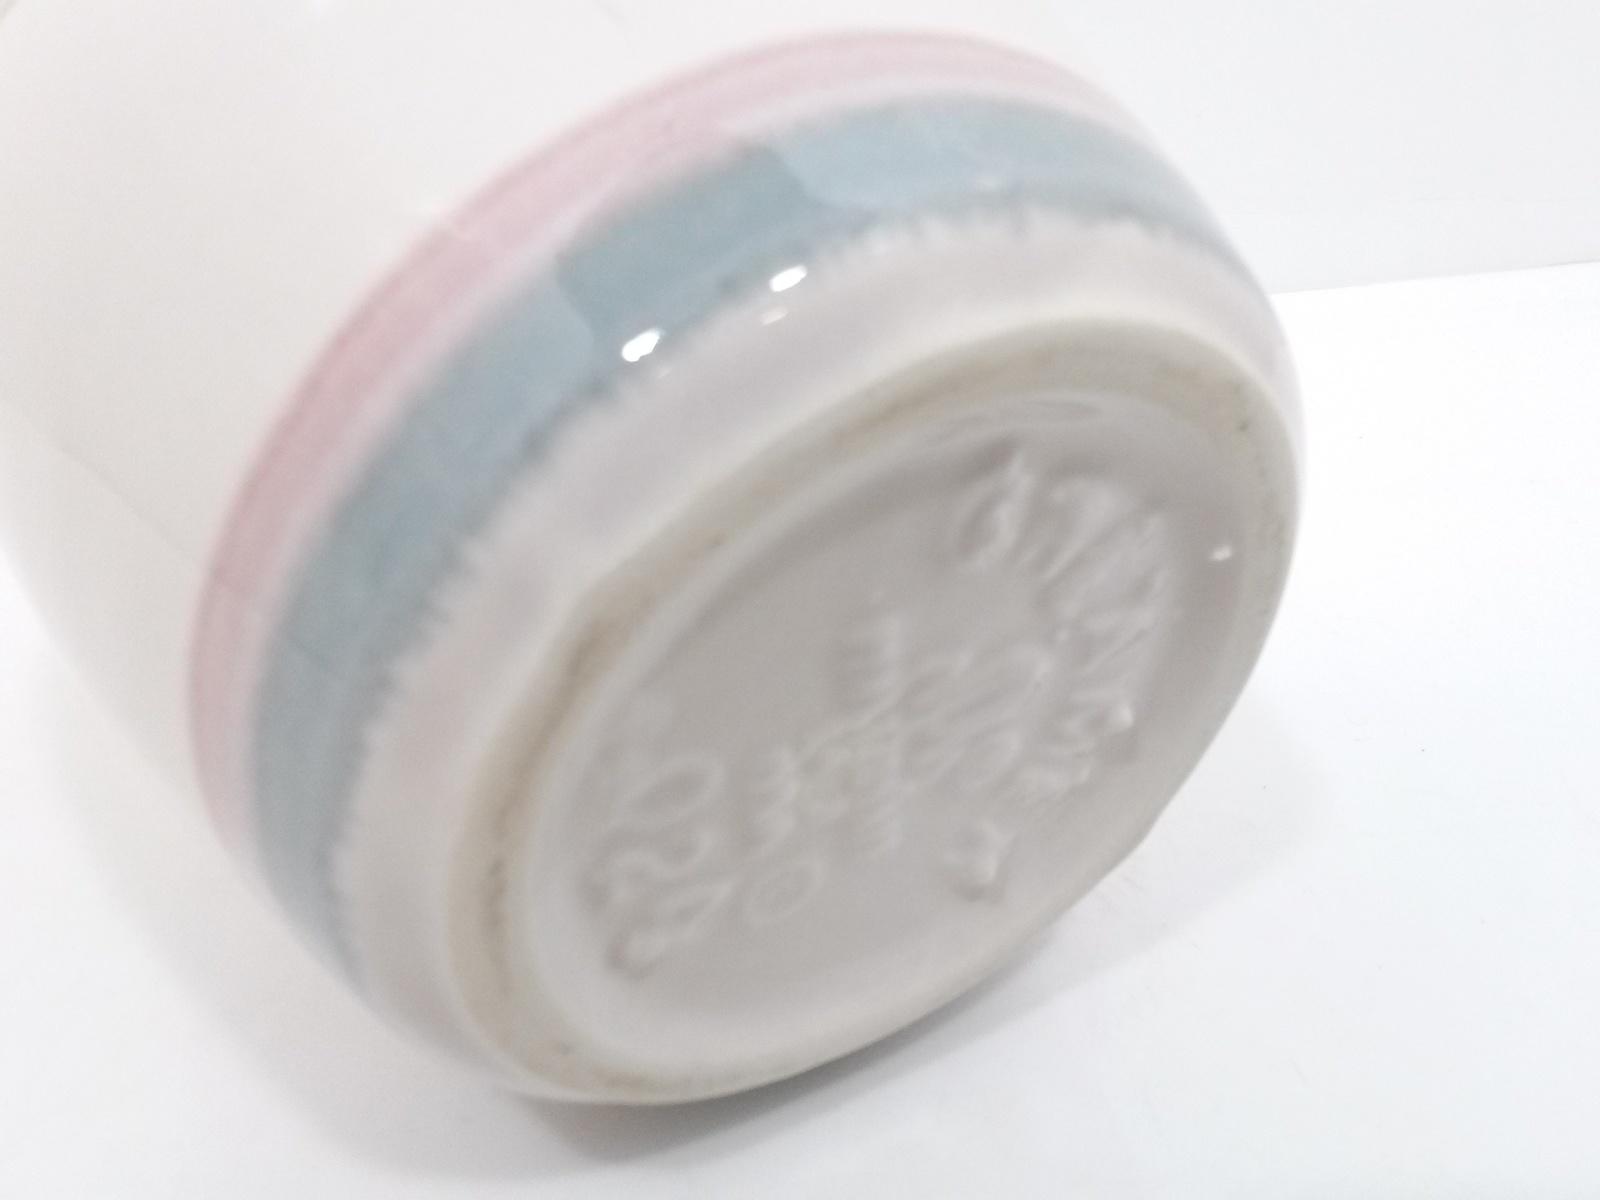 "PFALTZGRAFF AURA Creamer 4 1/4"" Tall Blue/Gray & Pink Bands"